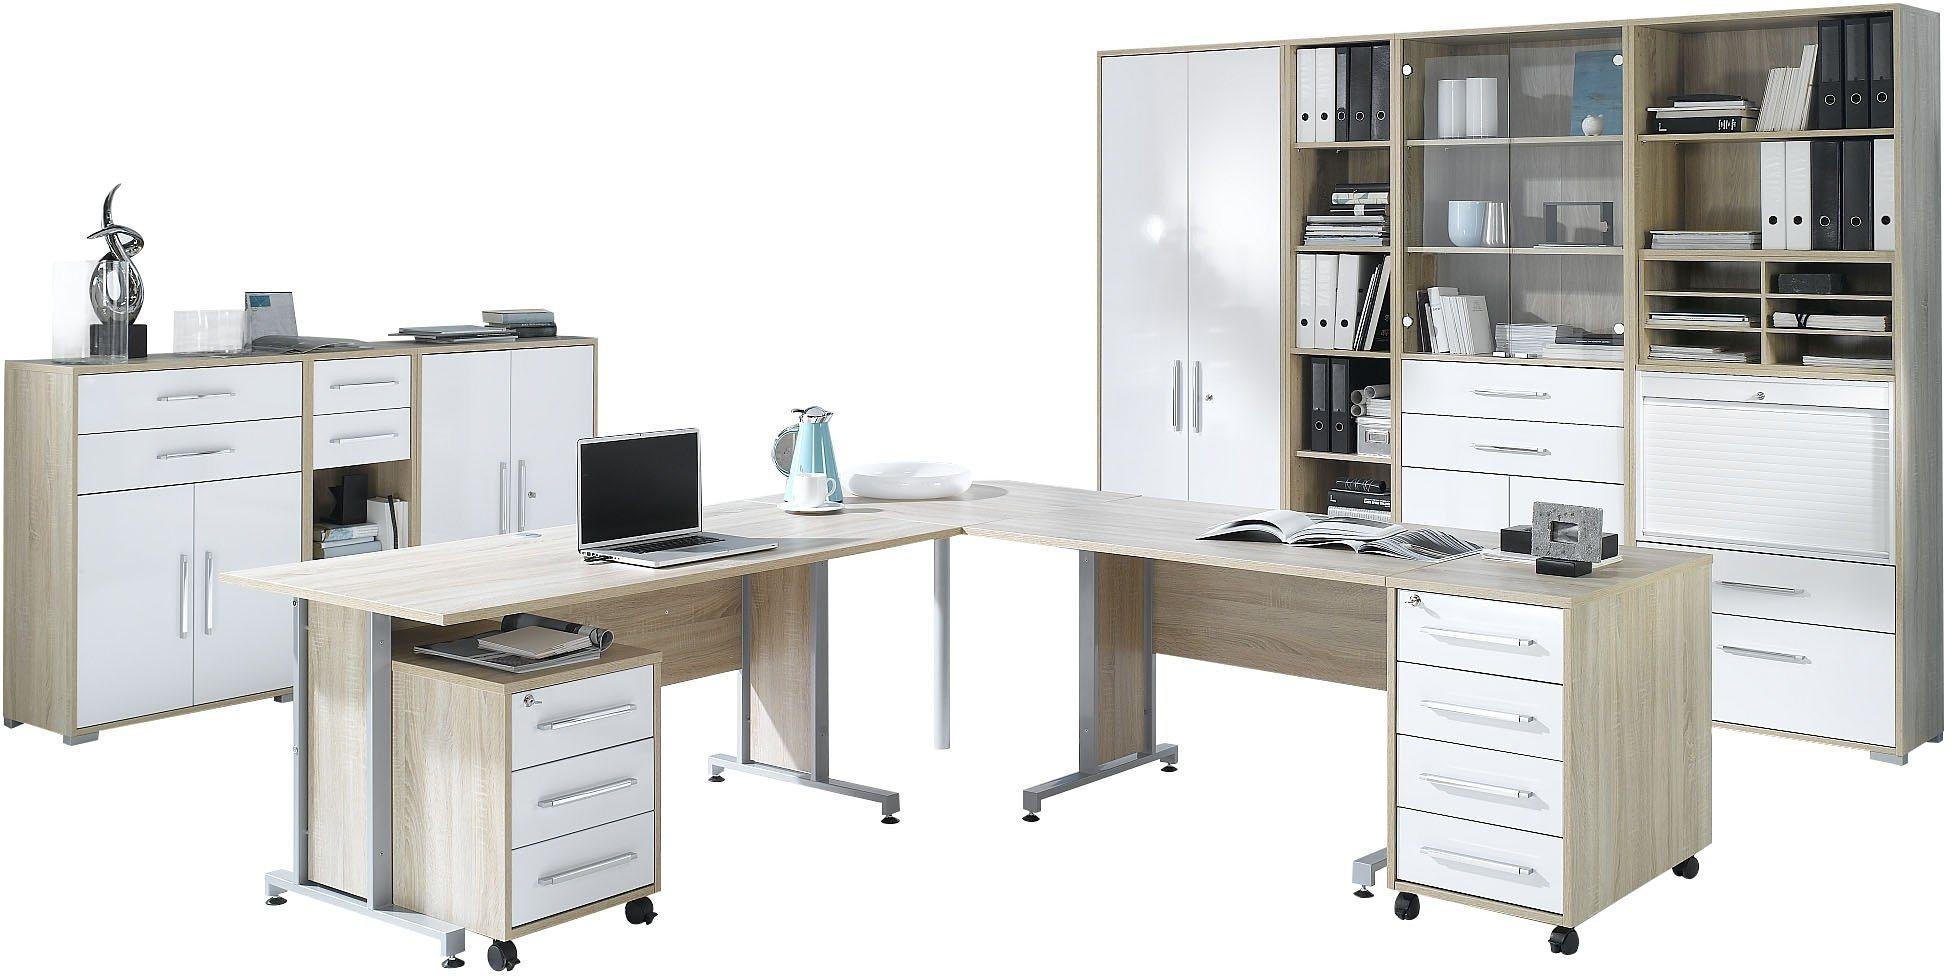 Maja Möbel Büromöbel-Set (6-tlg.) »1205« | Büro > Büromöbel-Serien | Weiß - Hochglanz | Hochglanz - Glänzend - Kunststoff - Abs | Maja Möbel